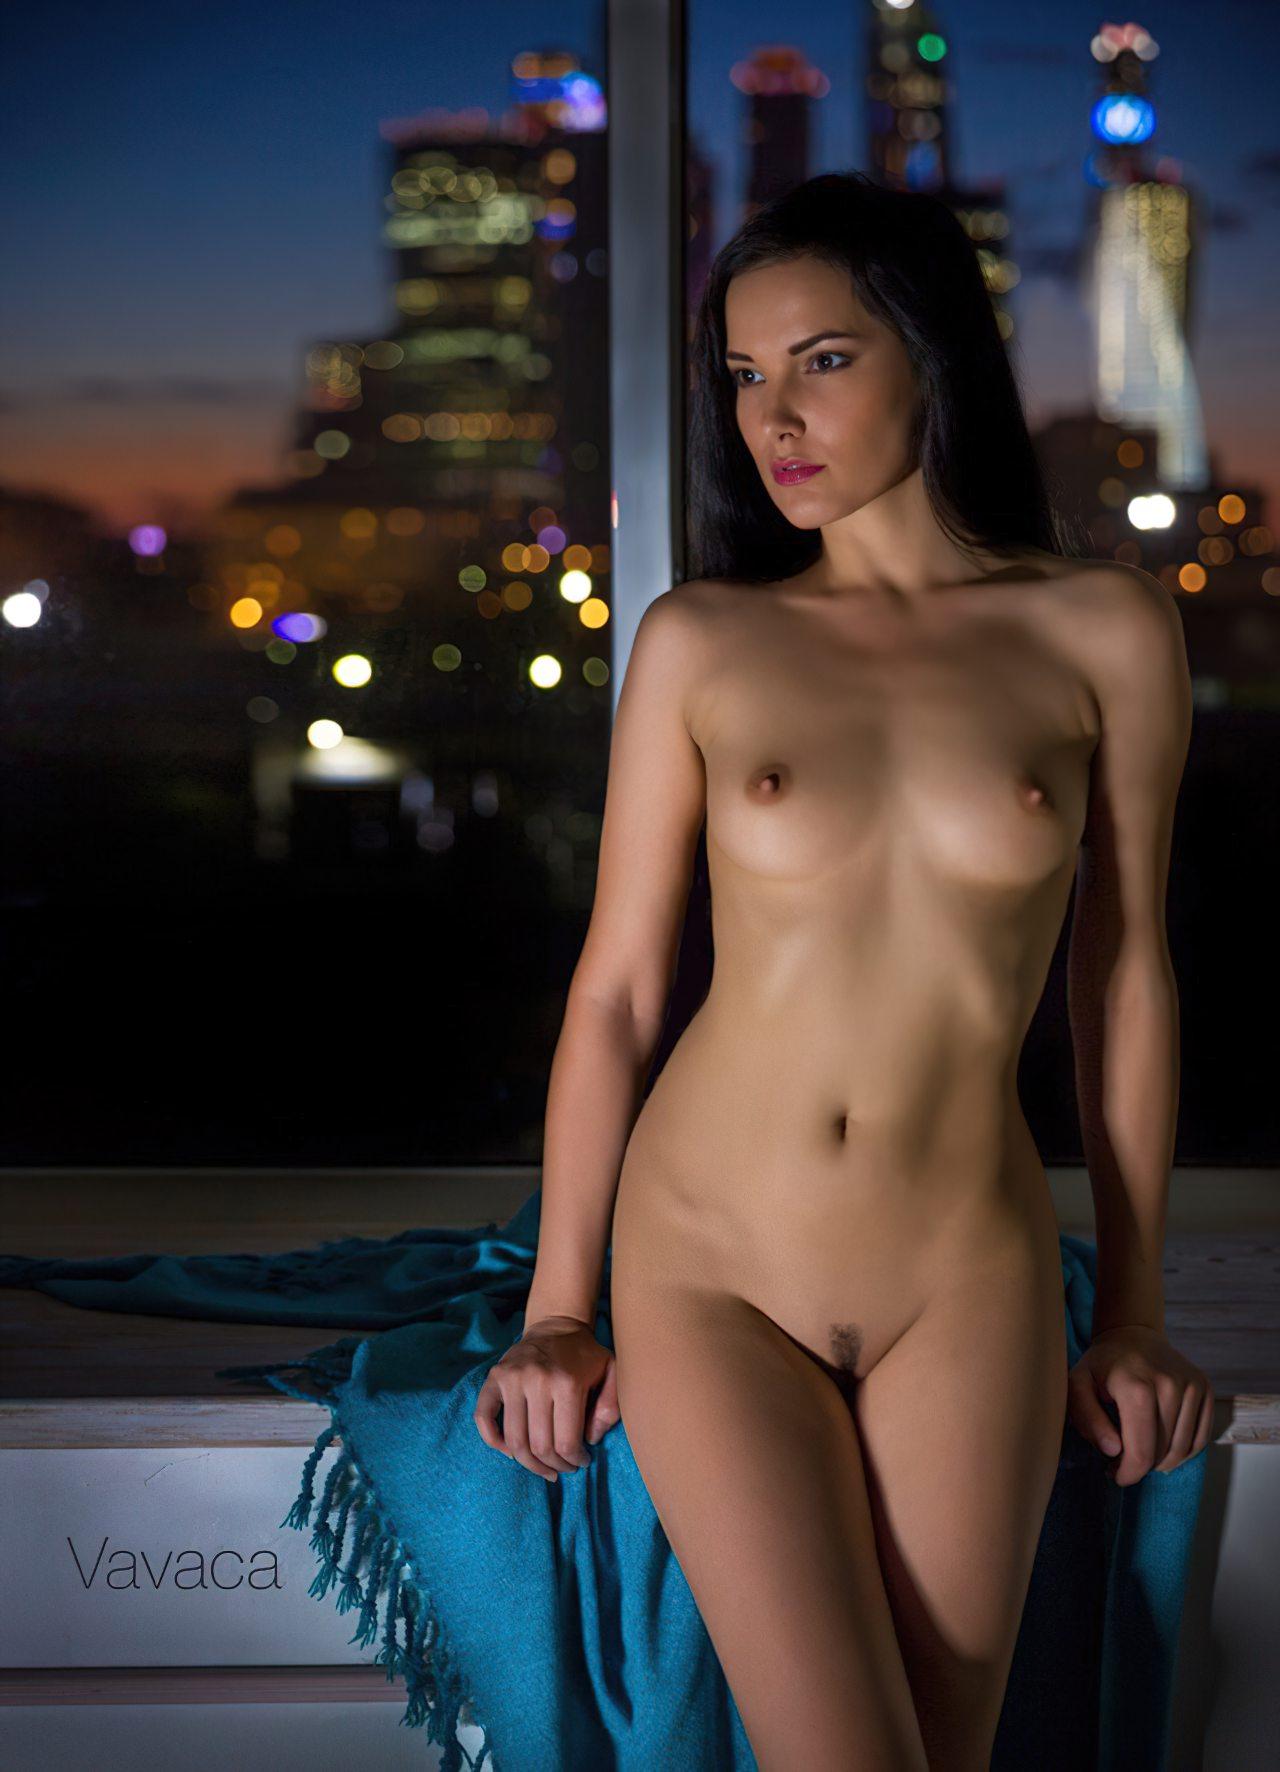 Fotos de Mulheres Despidas (42)